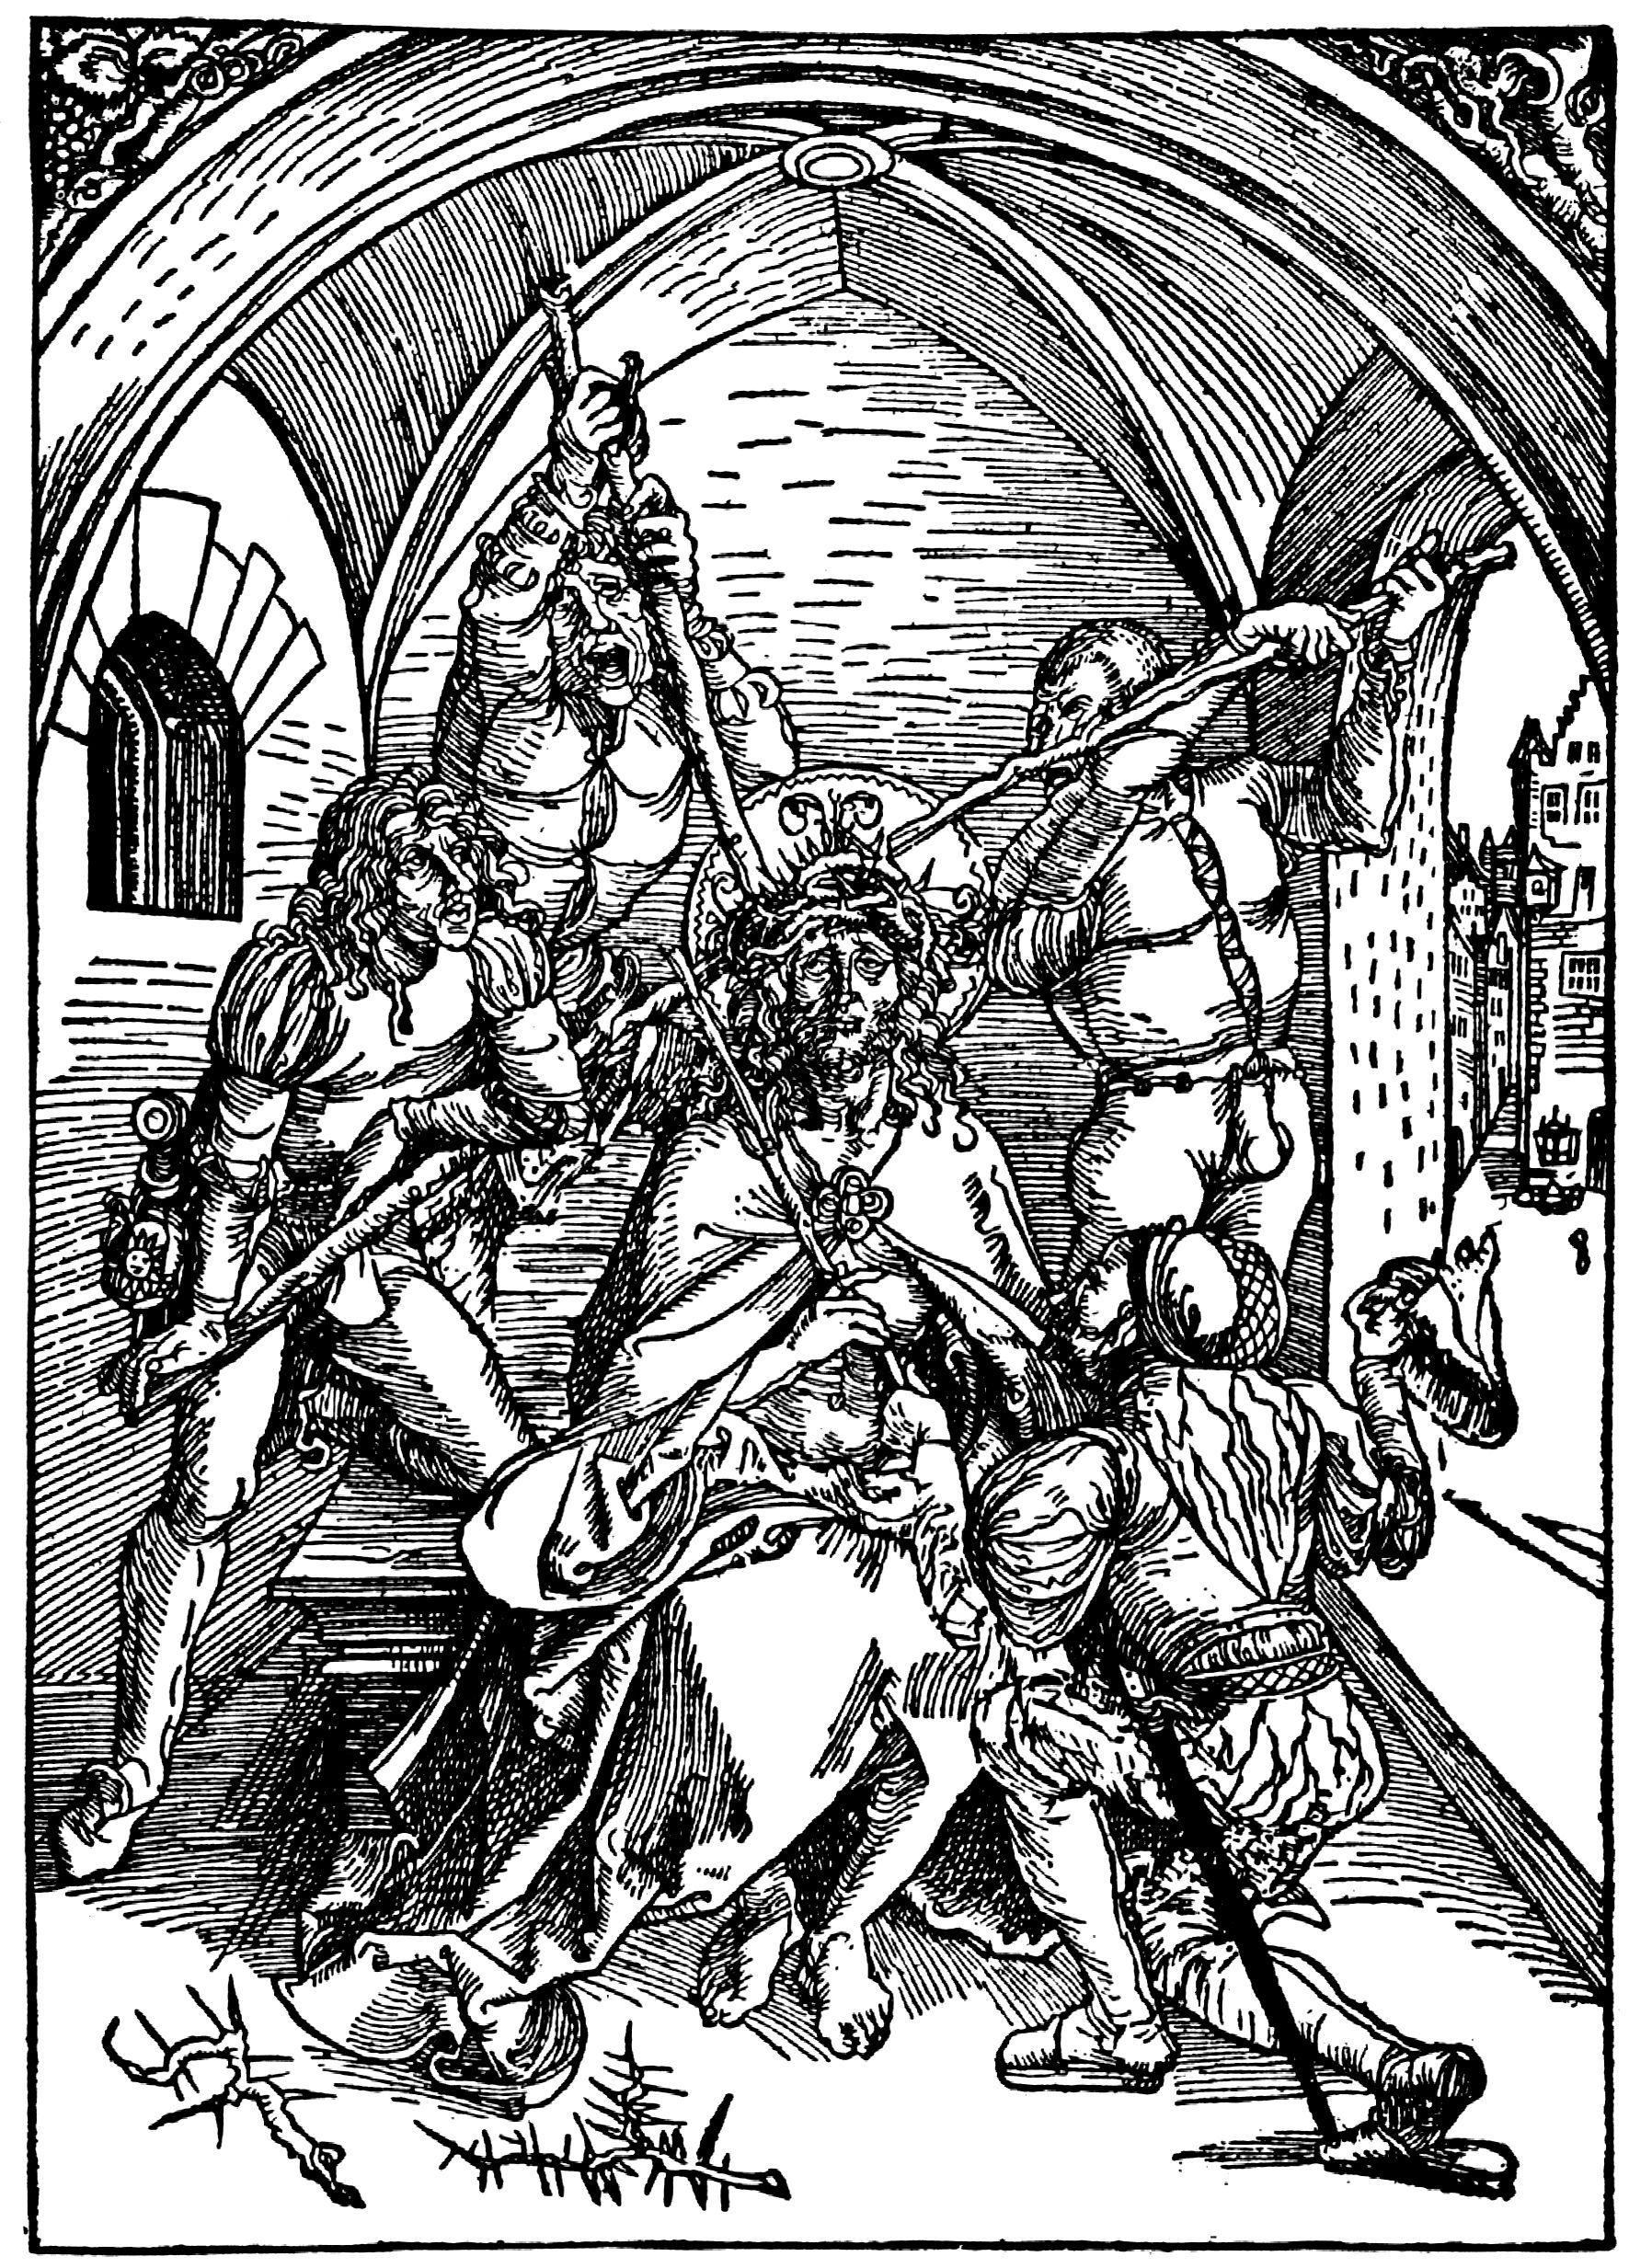 artist durer albrecht title die albertina passion szene dornenkronung christi date ca 1495 1497 kunstwerke holzschnitt kreuzigung jesus felice fey verschwiegene kunst moderne fotografie